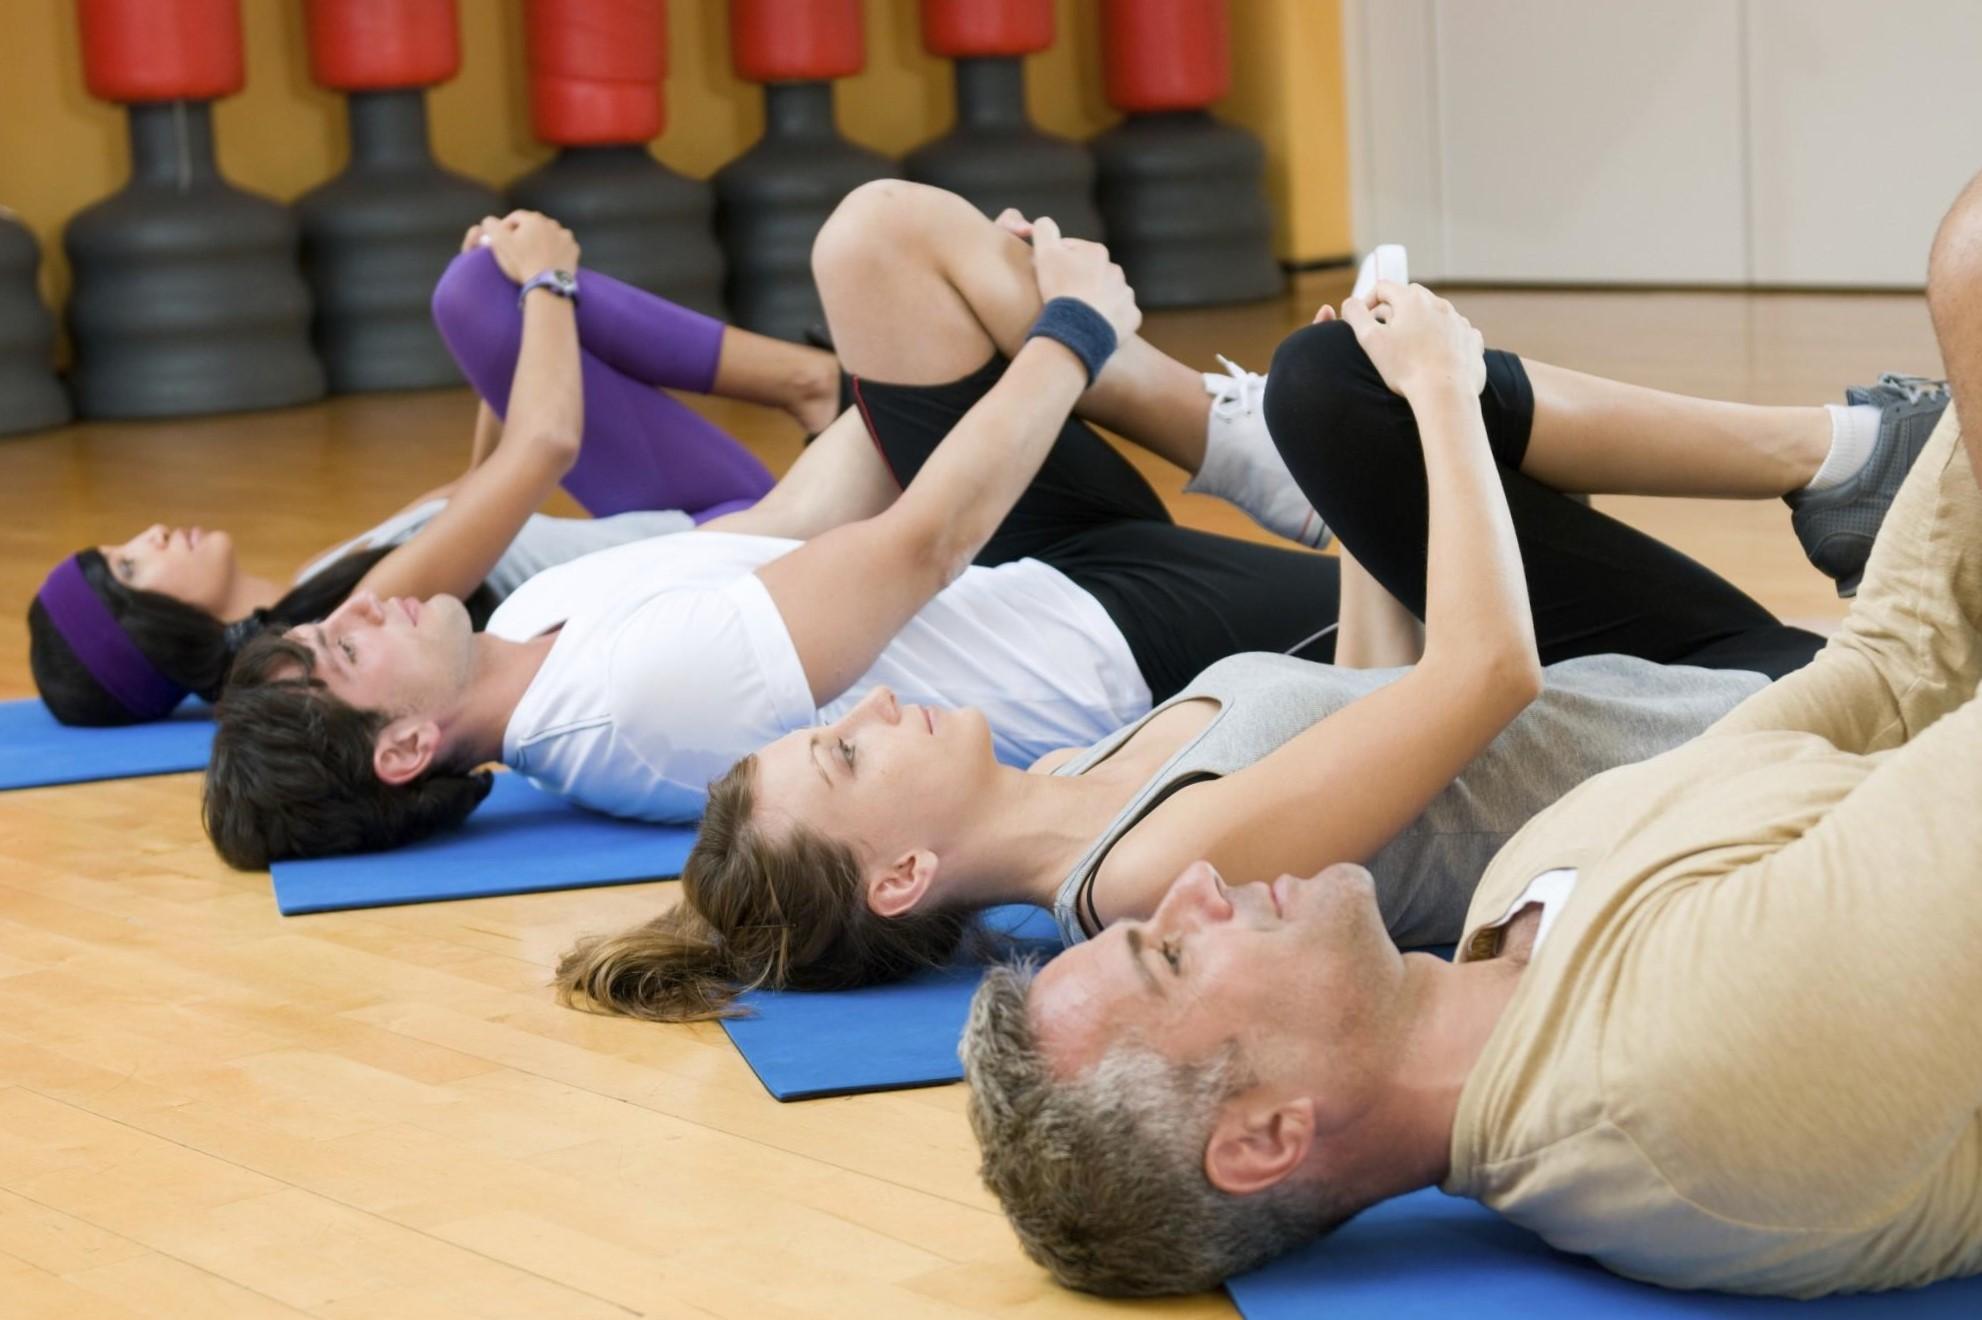 ginnastica posturale e fisioterapia fisiosan